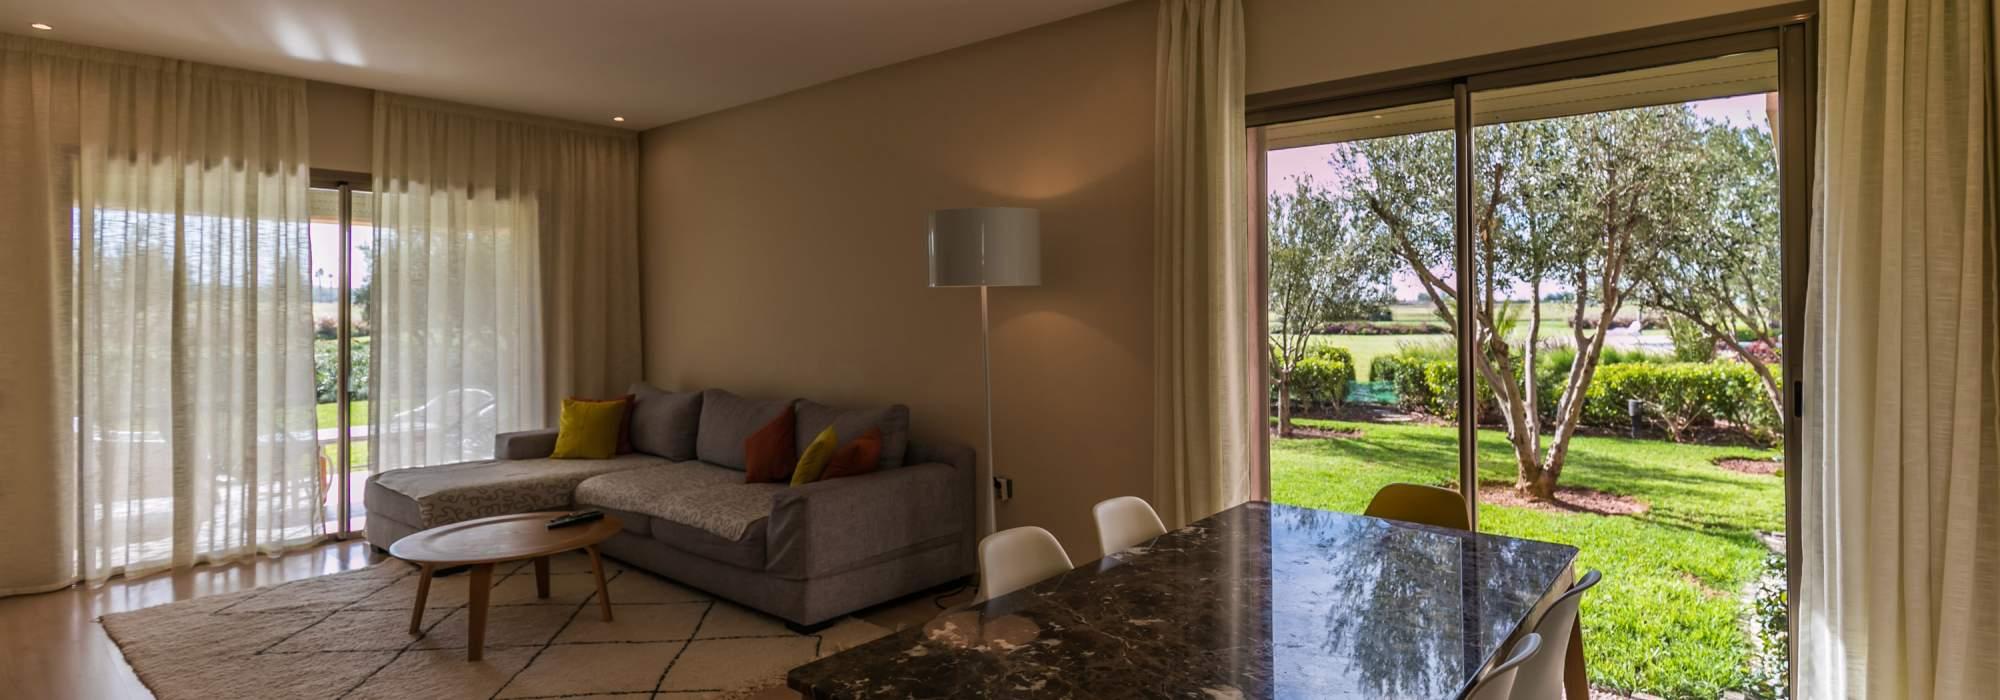 appartement a vendre front golf marrakech